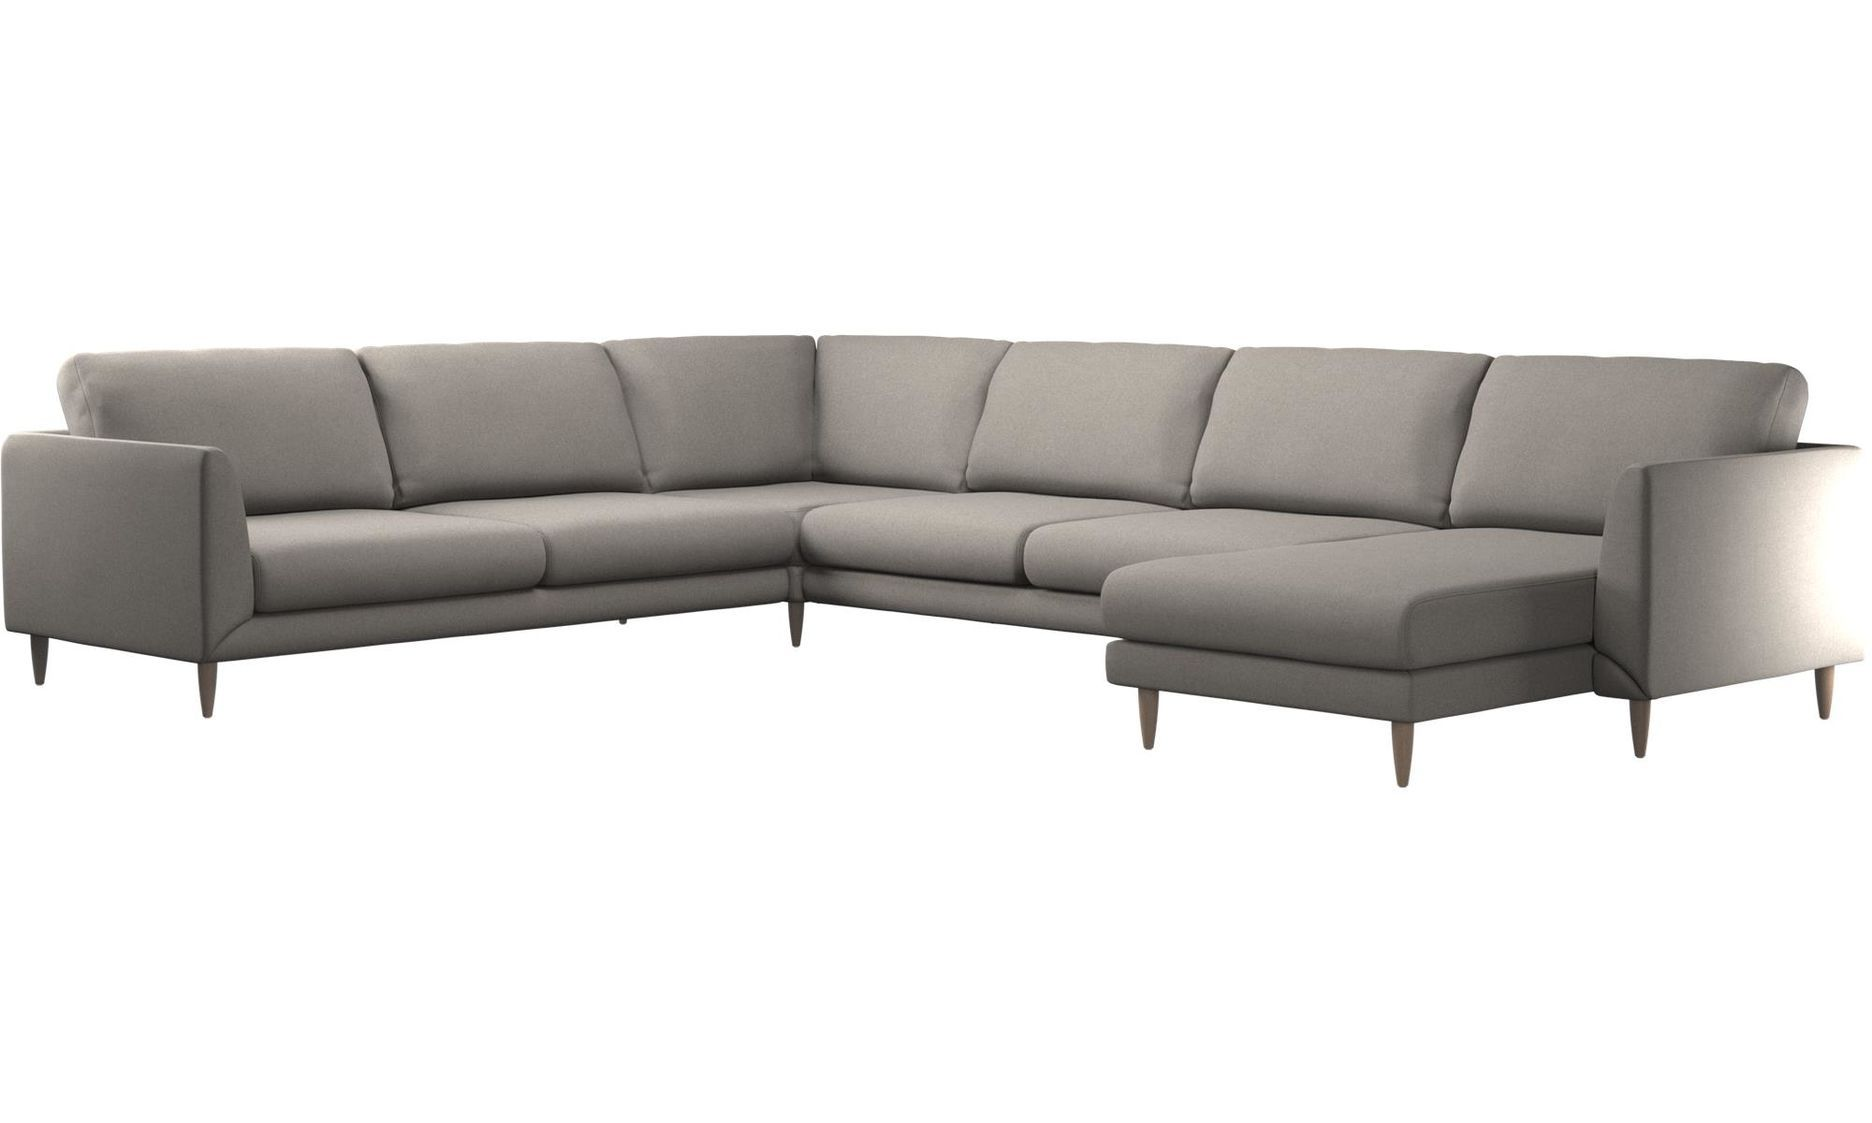 Chaise lounge sofas Fargo corner sofa with resting unit Gray